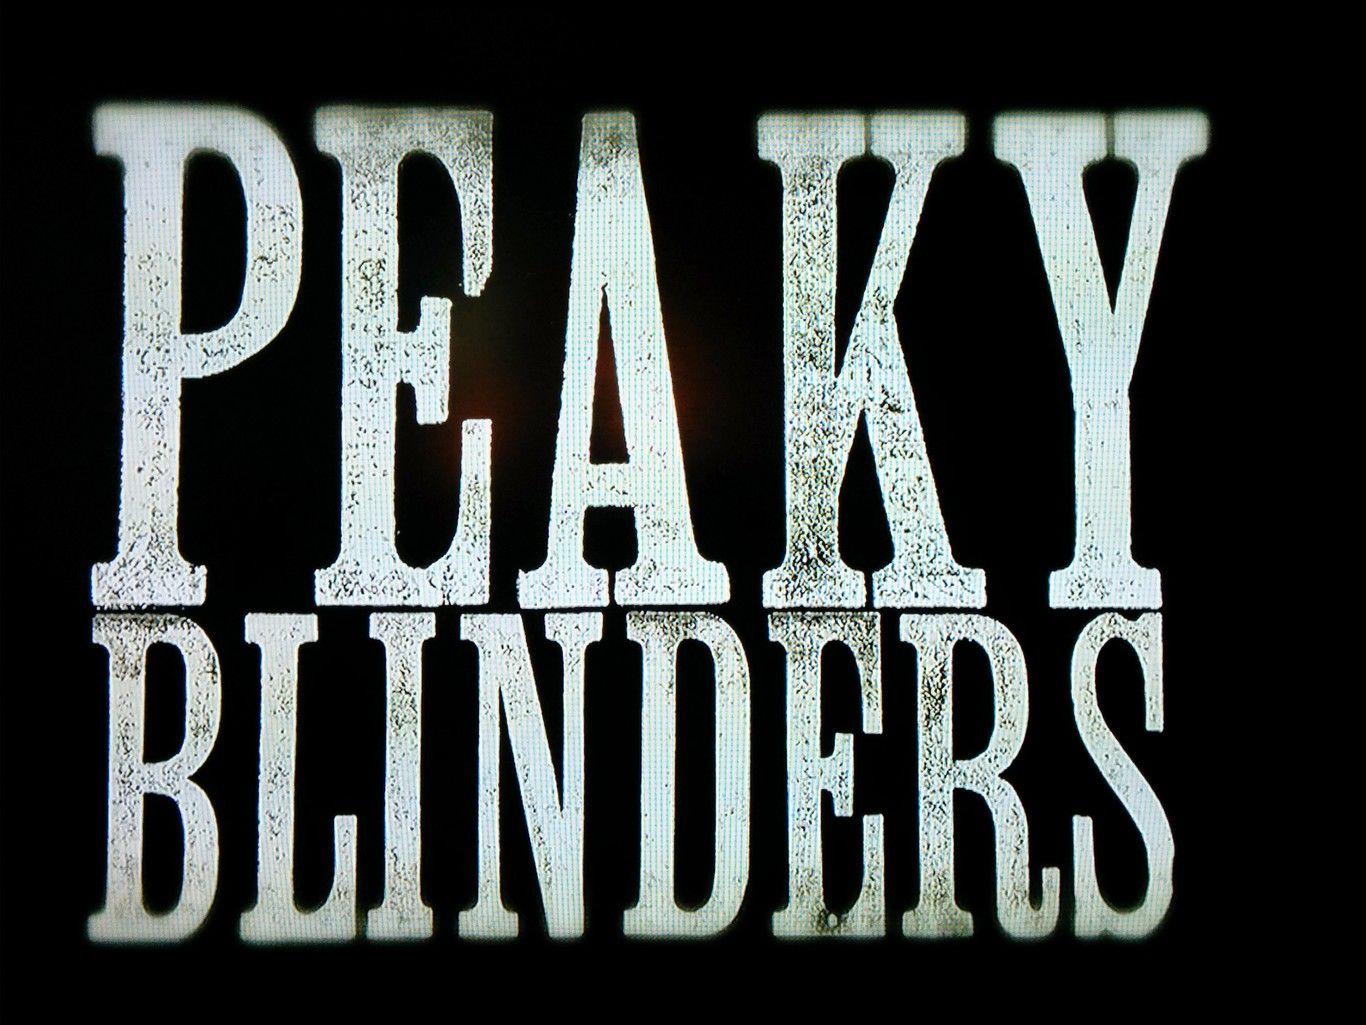 By Order of the Peaky Blinders: Habrá película de la exitosa serie